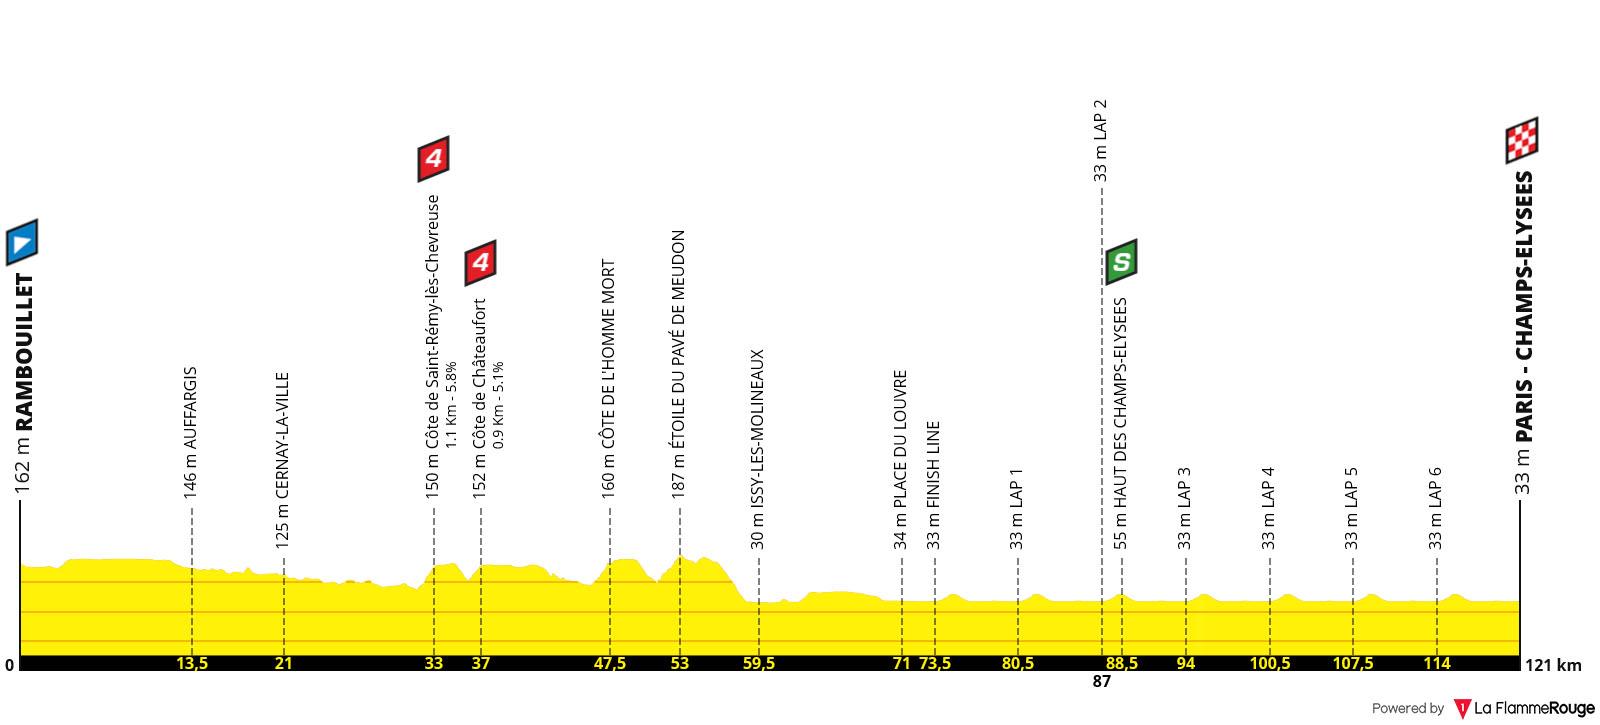 Perfil Etapa 21 - Tour de Francia 2019